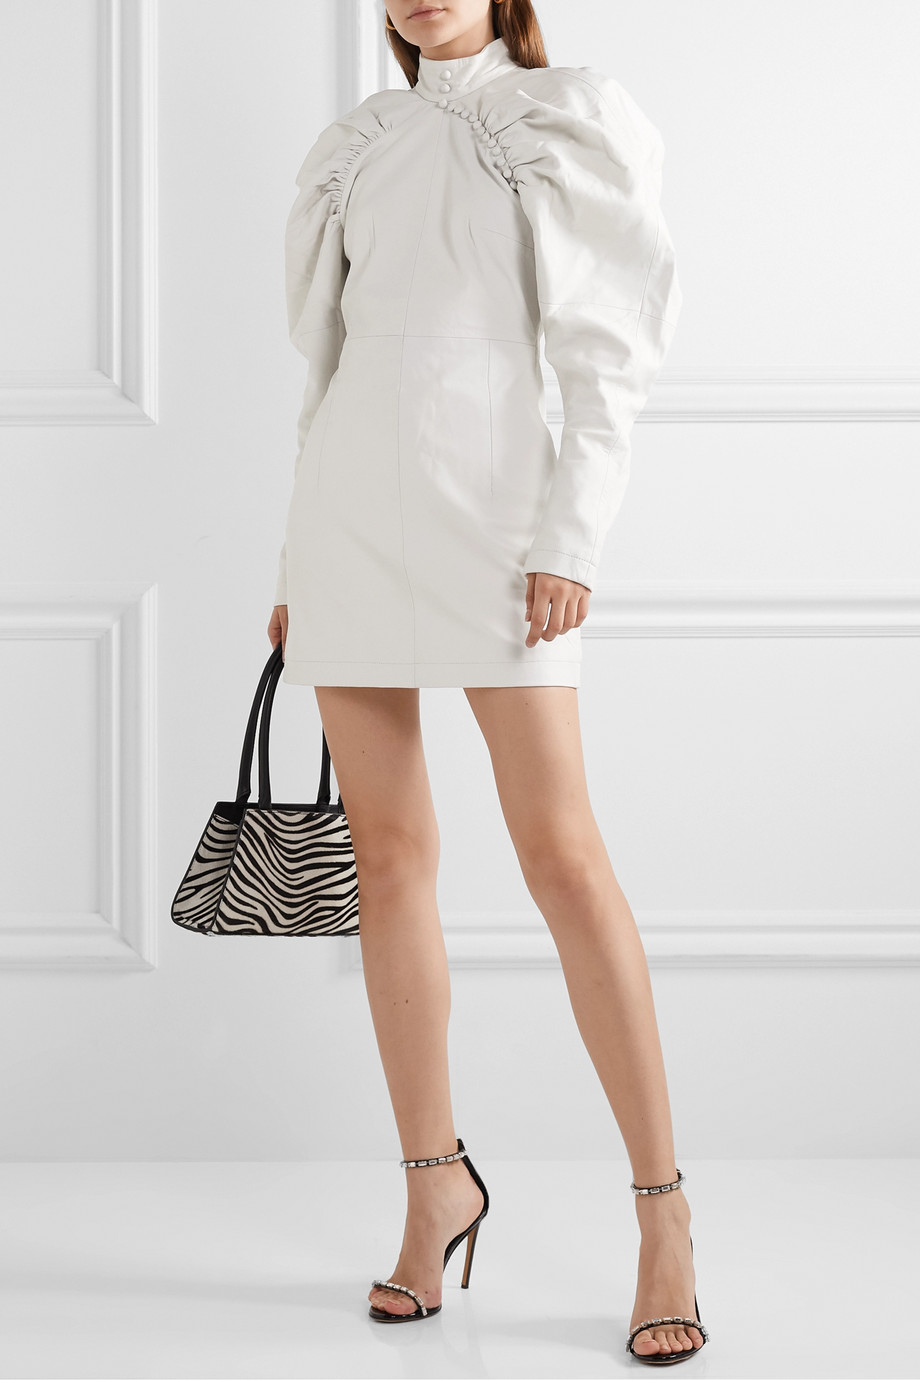 ROTATE Birger Christensen Kim button-detailed leather mini dress